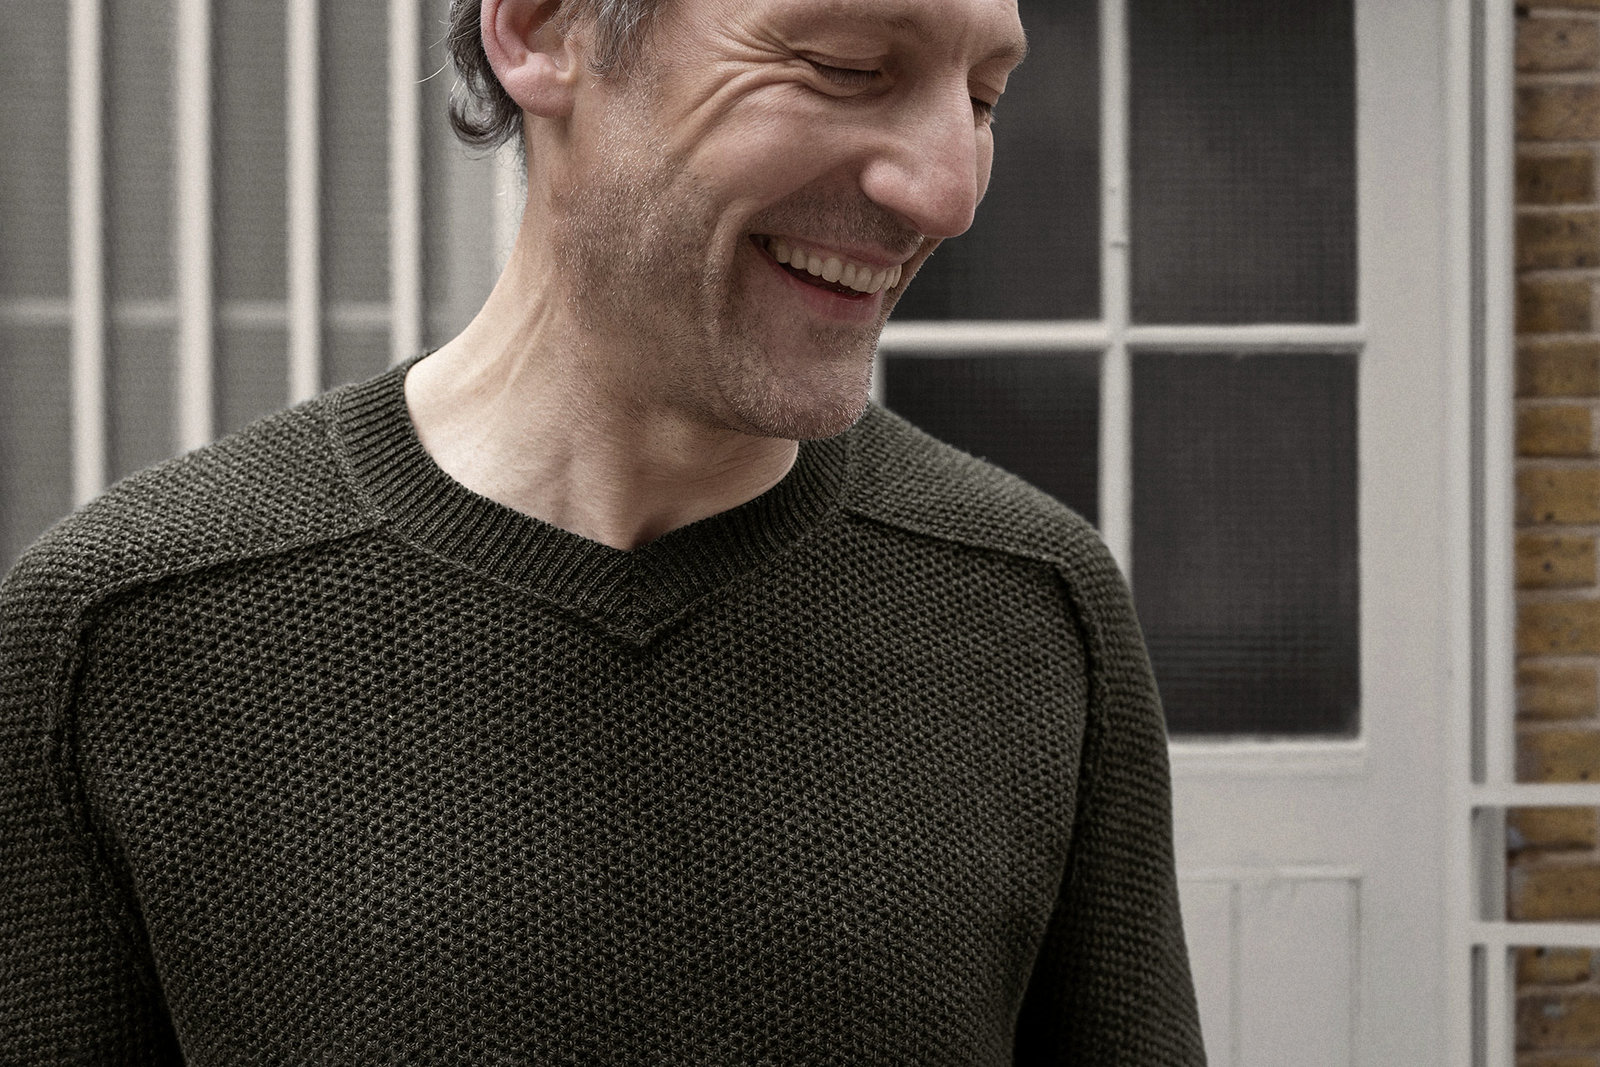 v-neck-sweater-cotton-seaweed-green-worn-1@2x.jpg